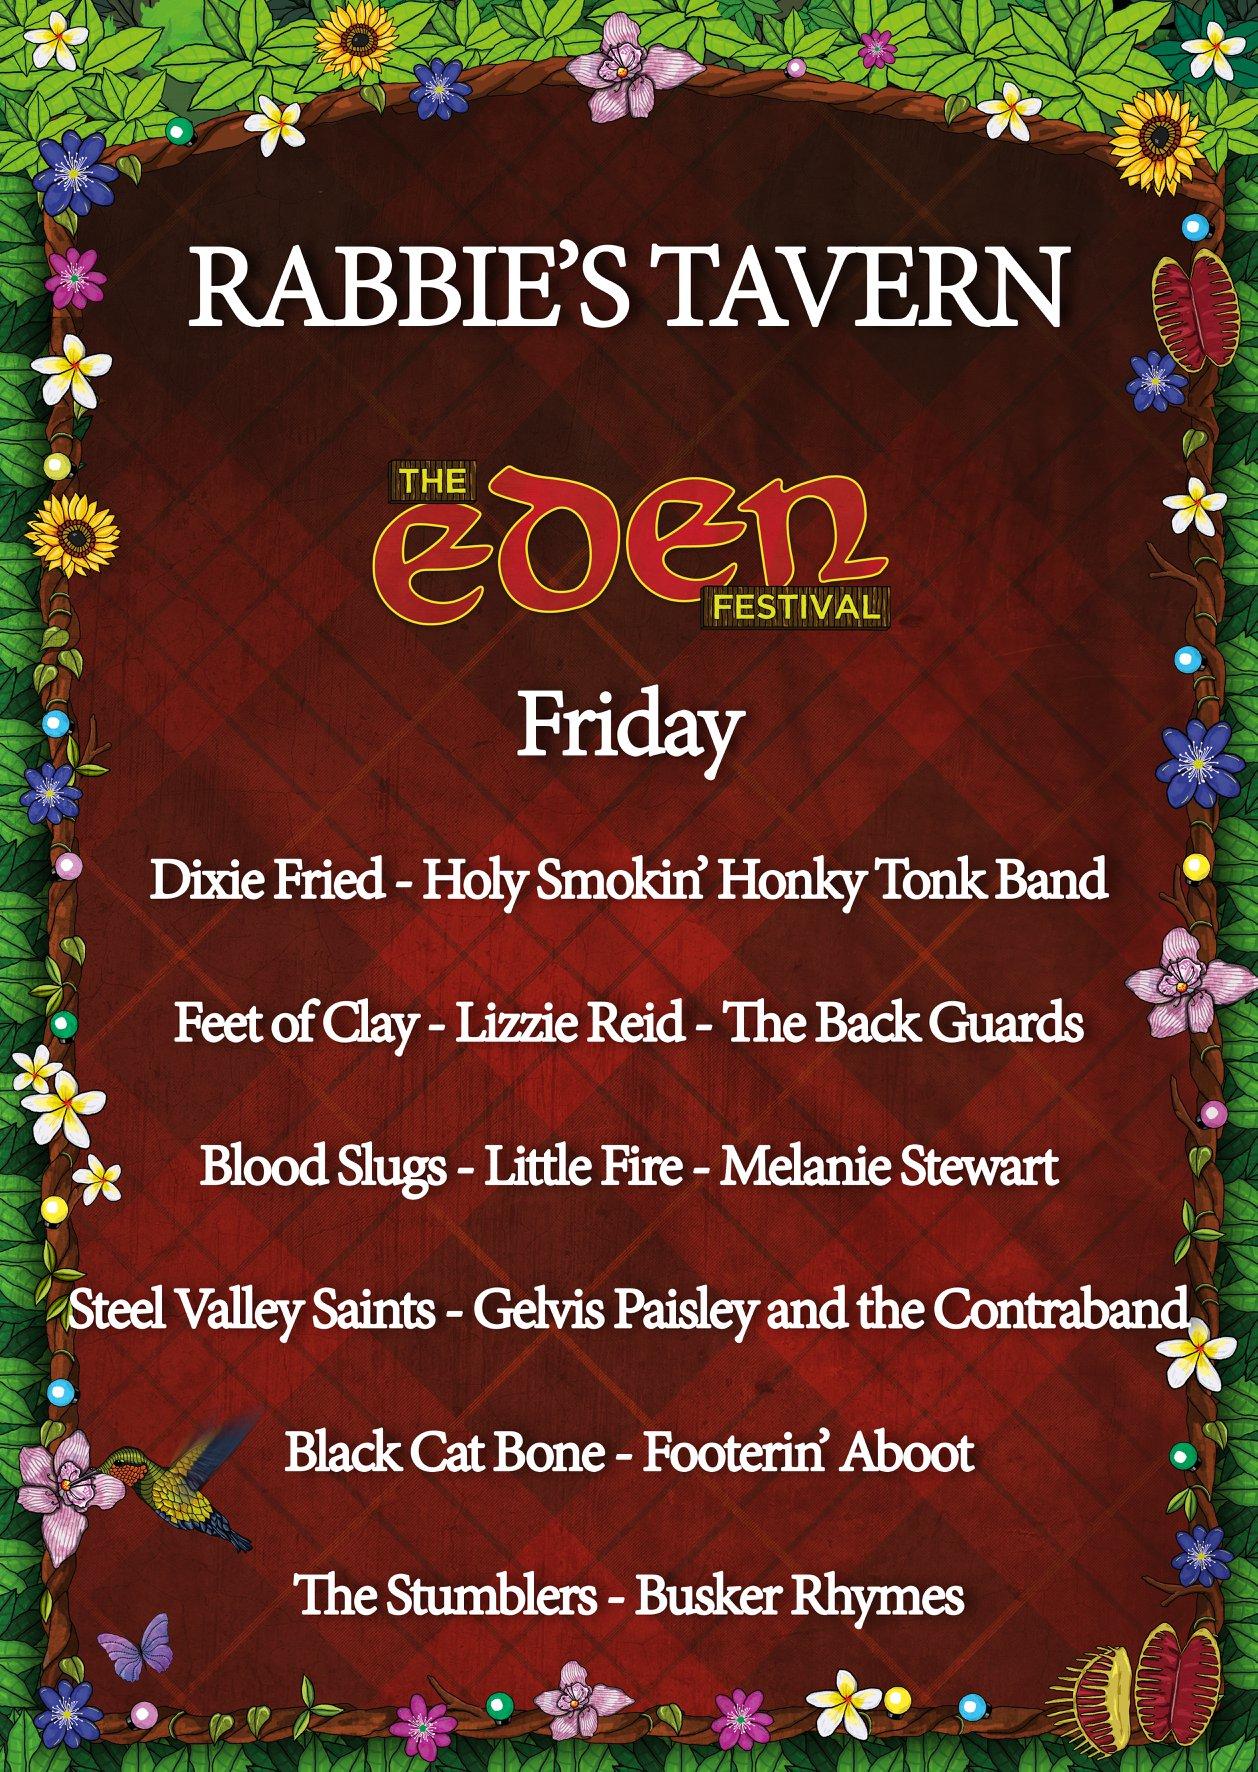 Friday line up at Rabbies Tavern